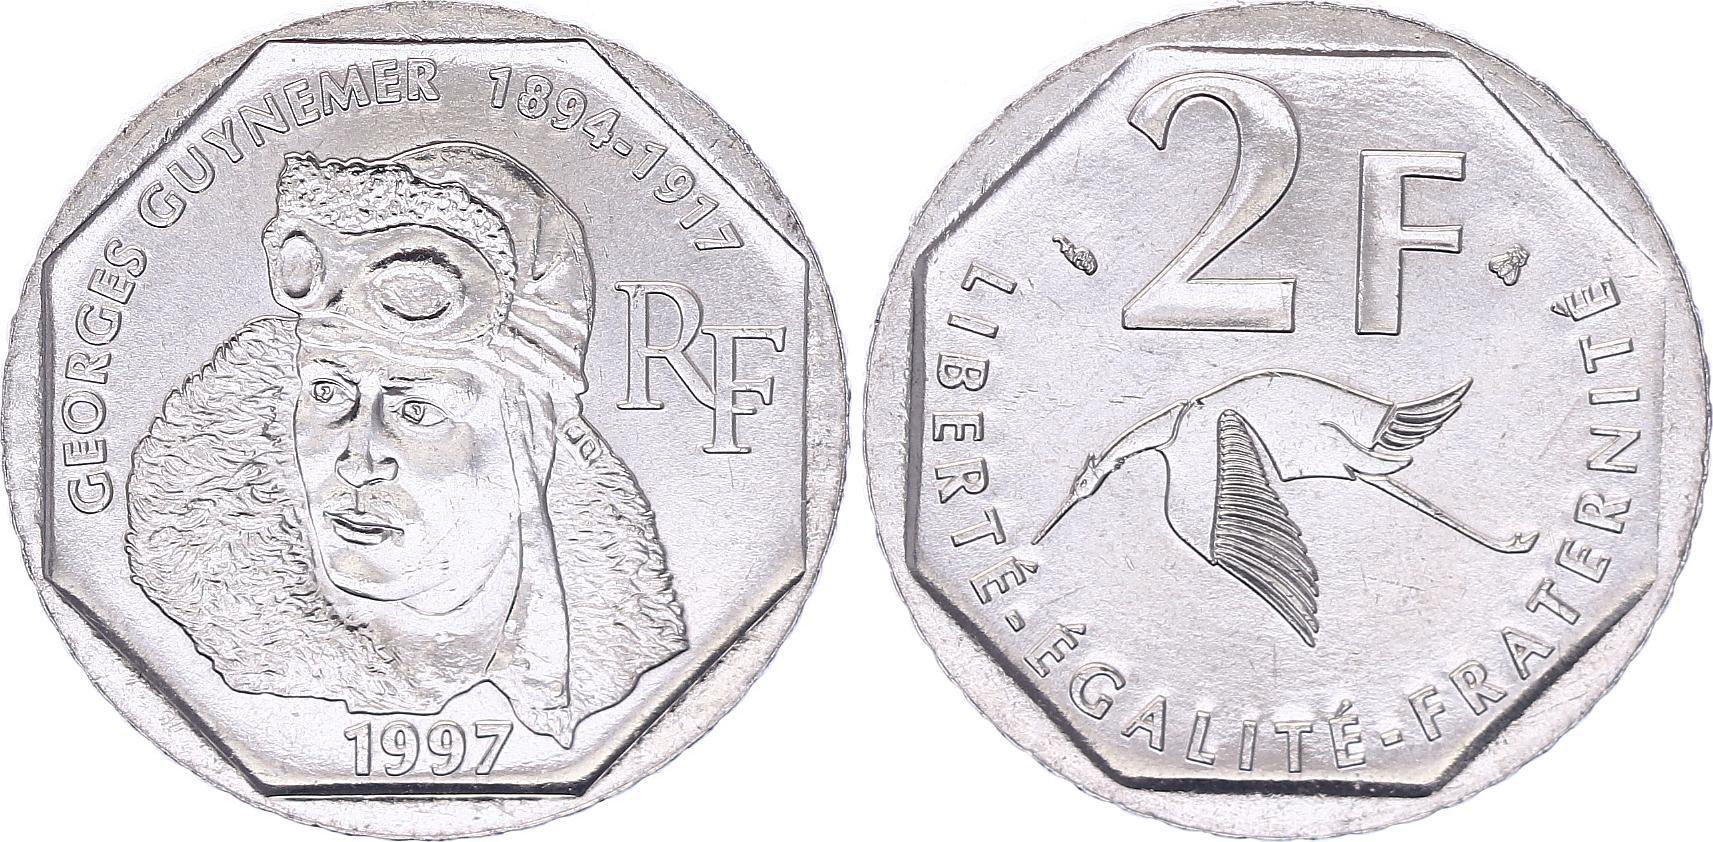 France 2 Francs Georges Guynemer - 1997 - FDC